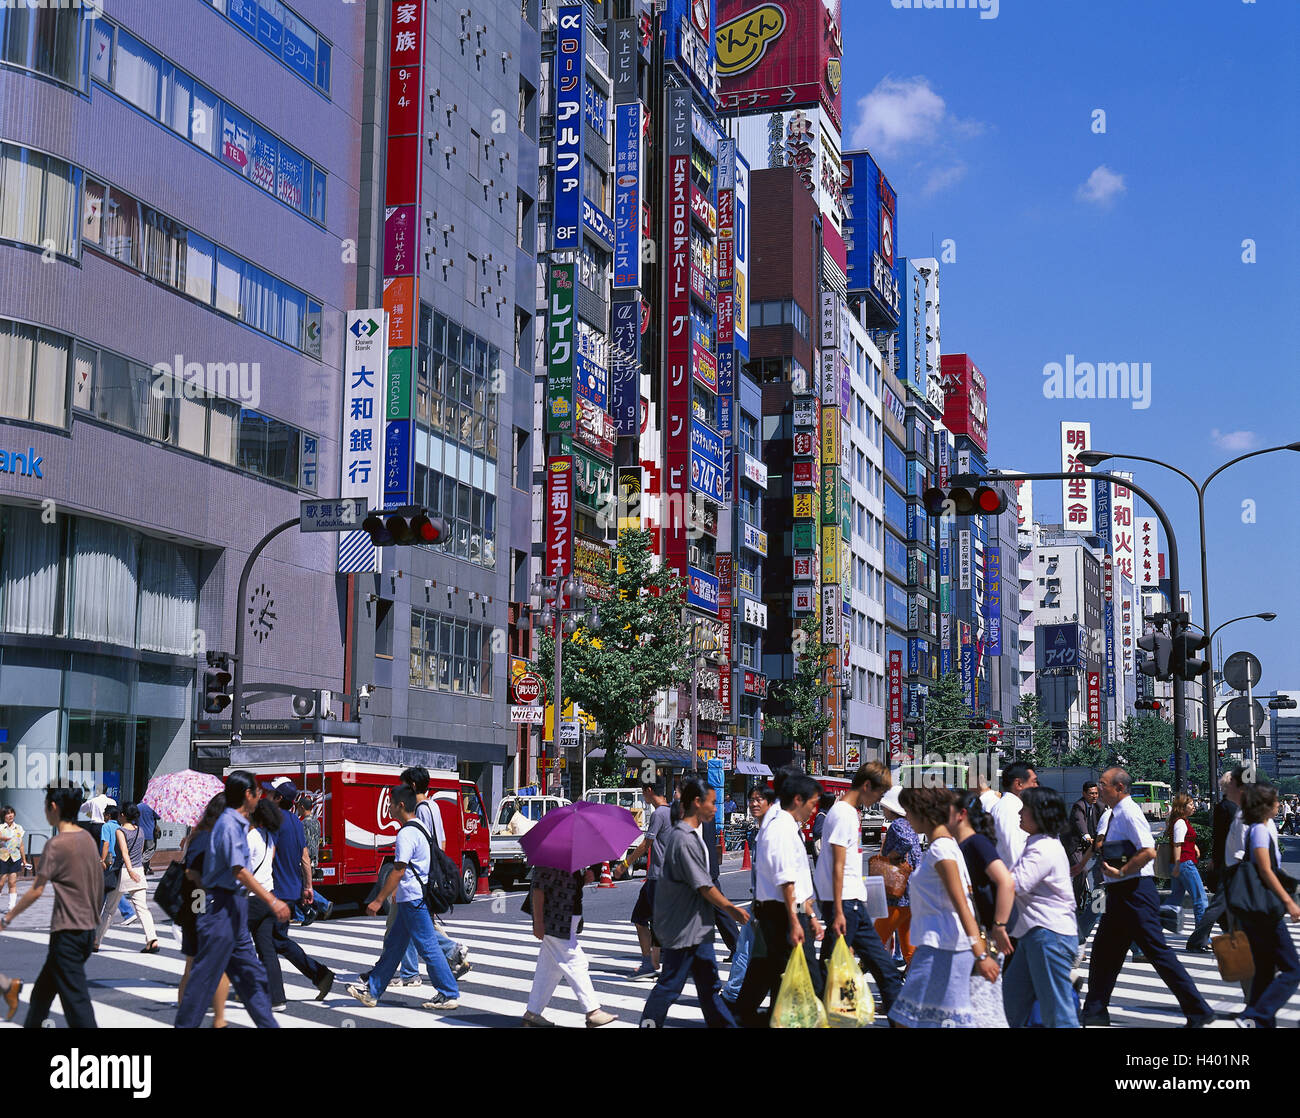 Japan, Honshu, Tokyo, Shinjuku, department stores, street scene, zebra crossing, pedestrian Asia, Tokyo, capital, - Stock Image